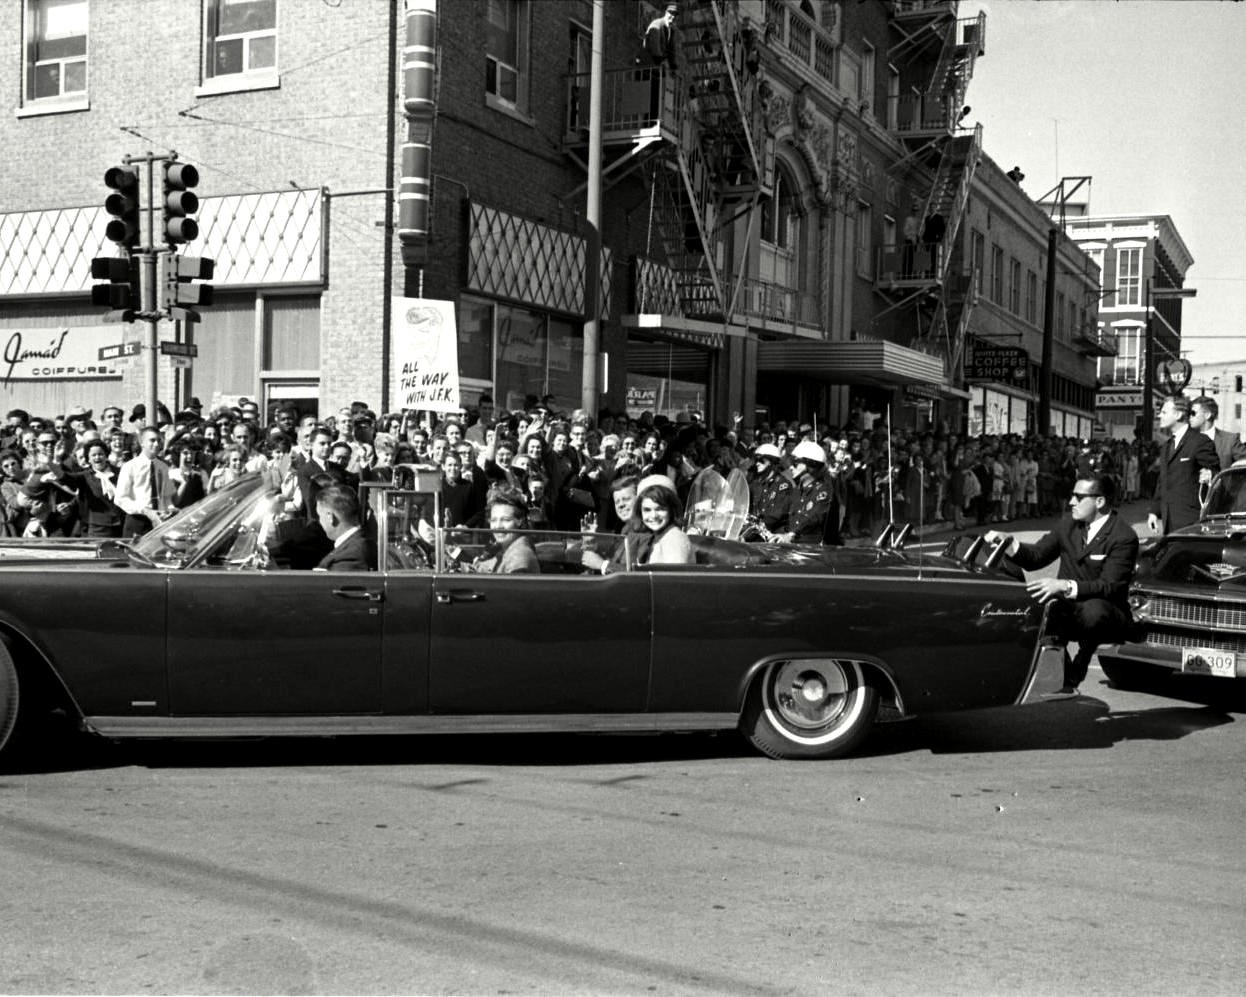 JOHN F. KENNEDY LIMOUSINE TURNS ON TO MAIN STREET IN DALLAS 8X10 PHOTO (BB-622)